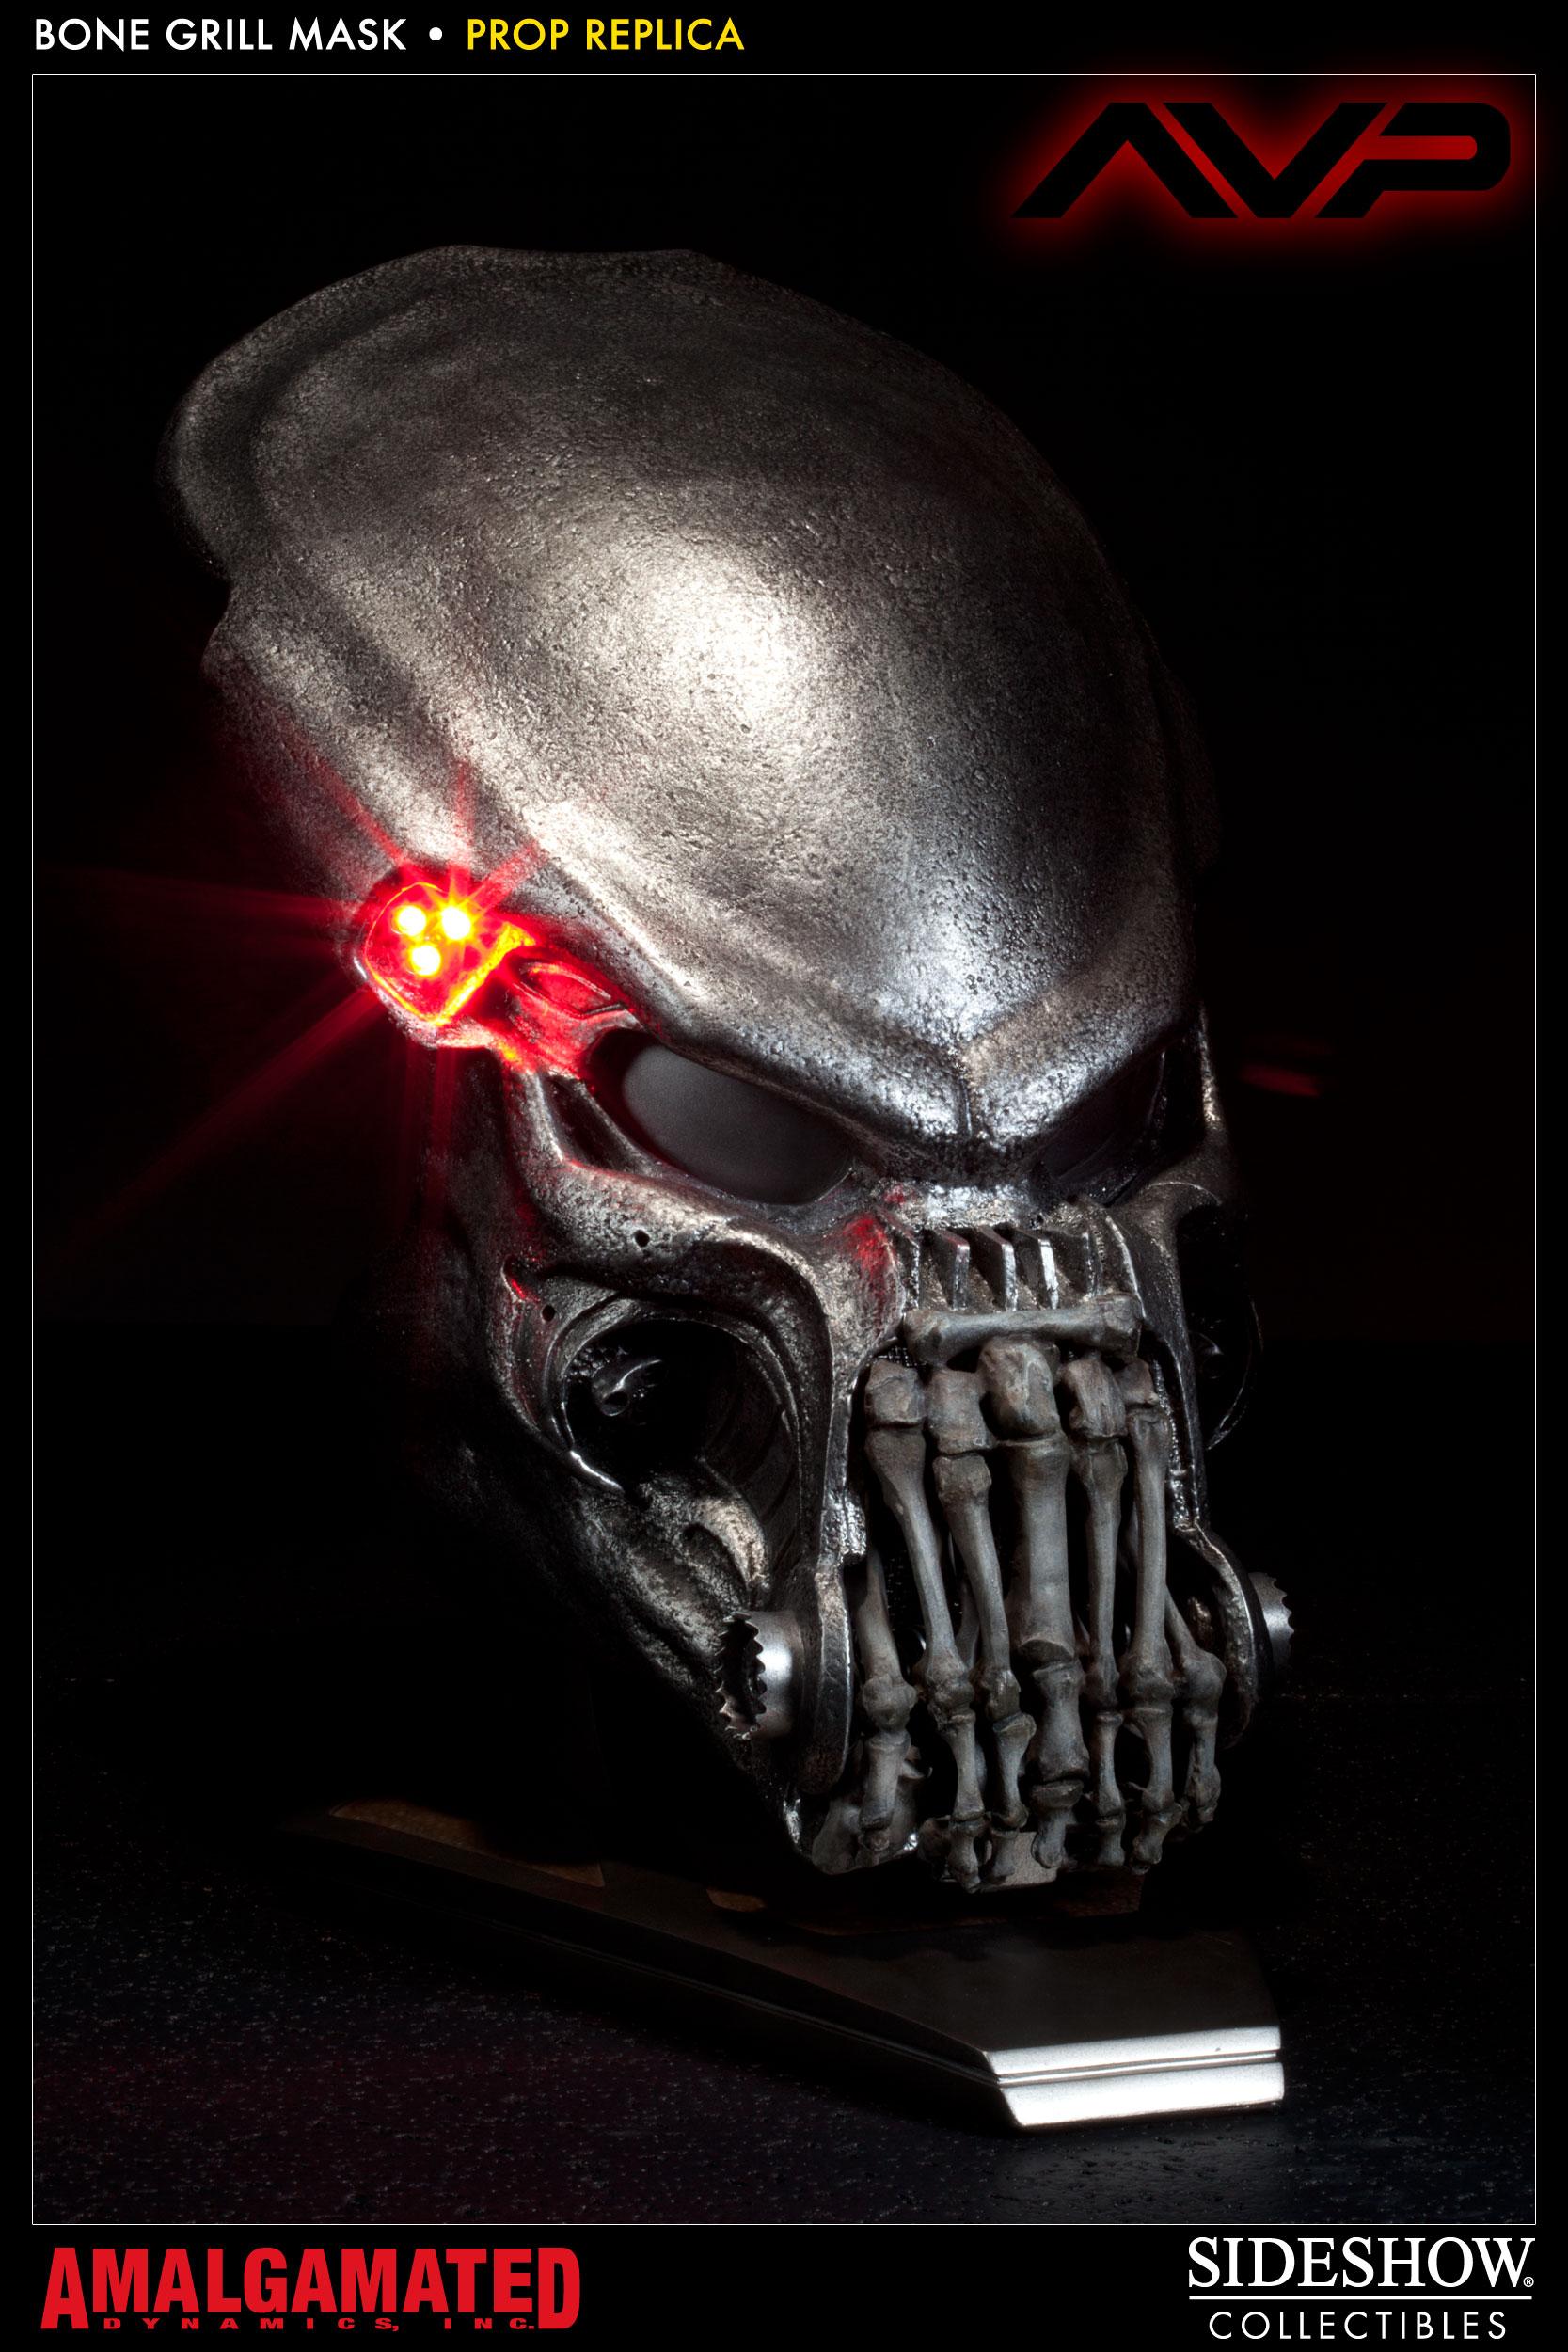 Sideshow-AVP-Predator-Bone-Grill-Bio-02.jpg